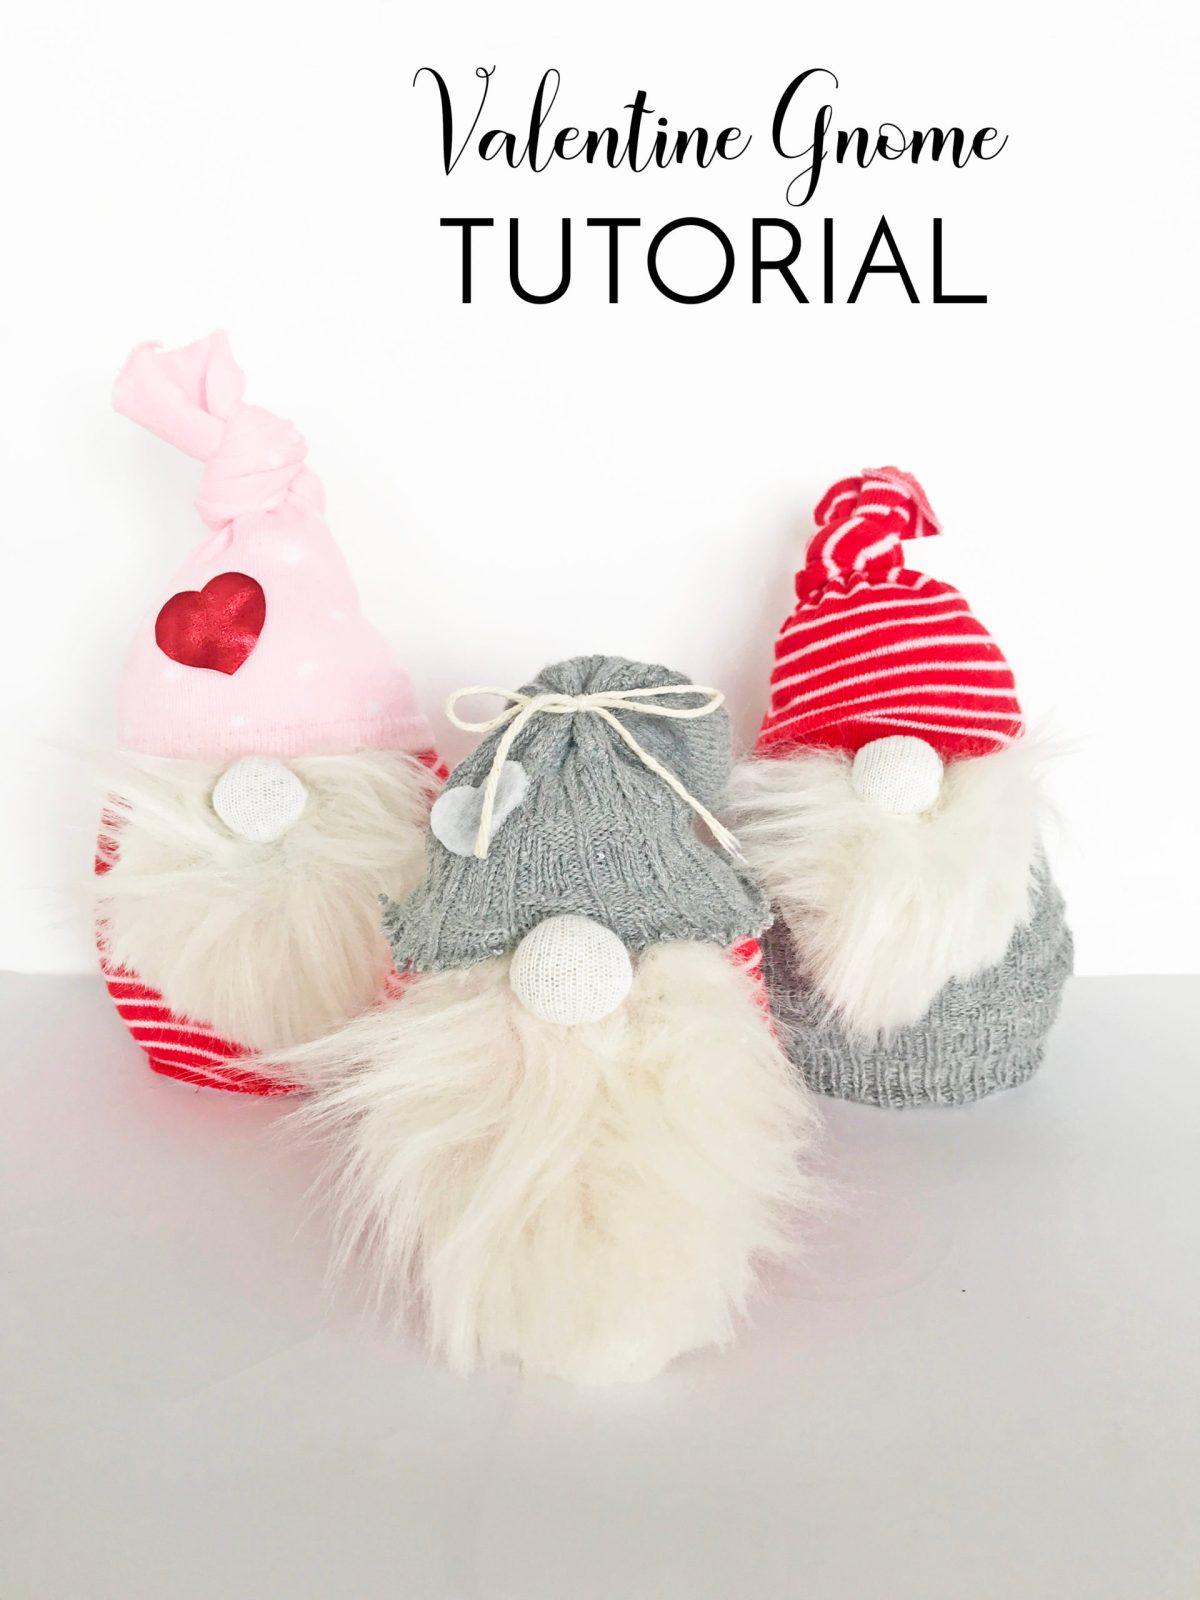 Valentine Gnome Tutorial 1